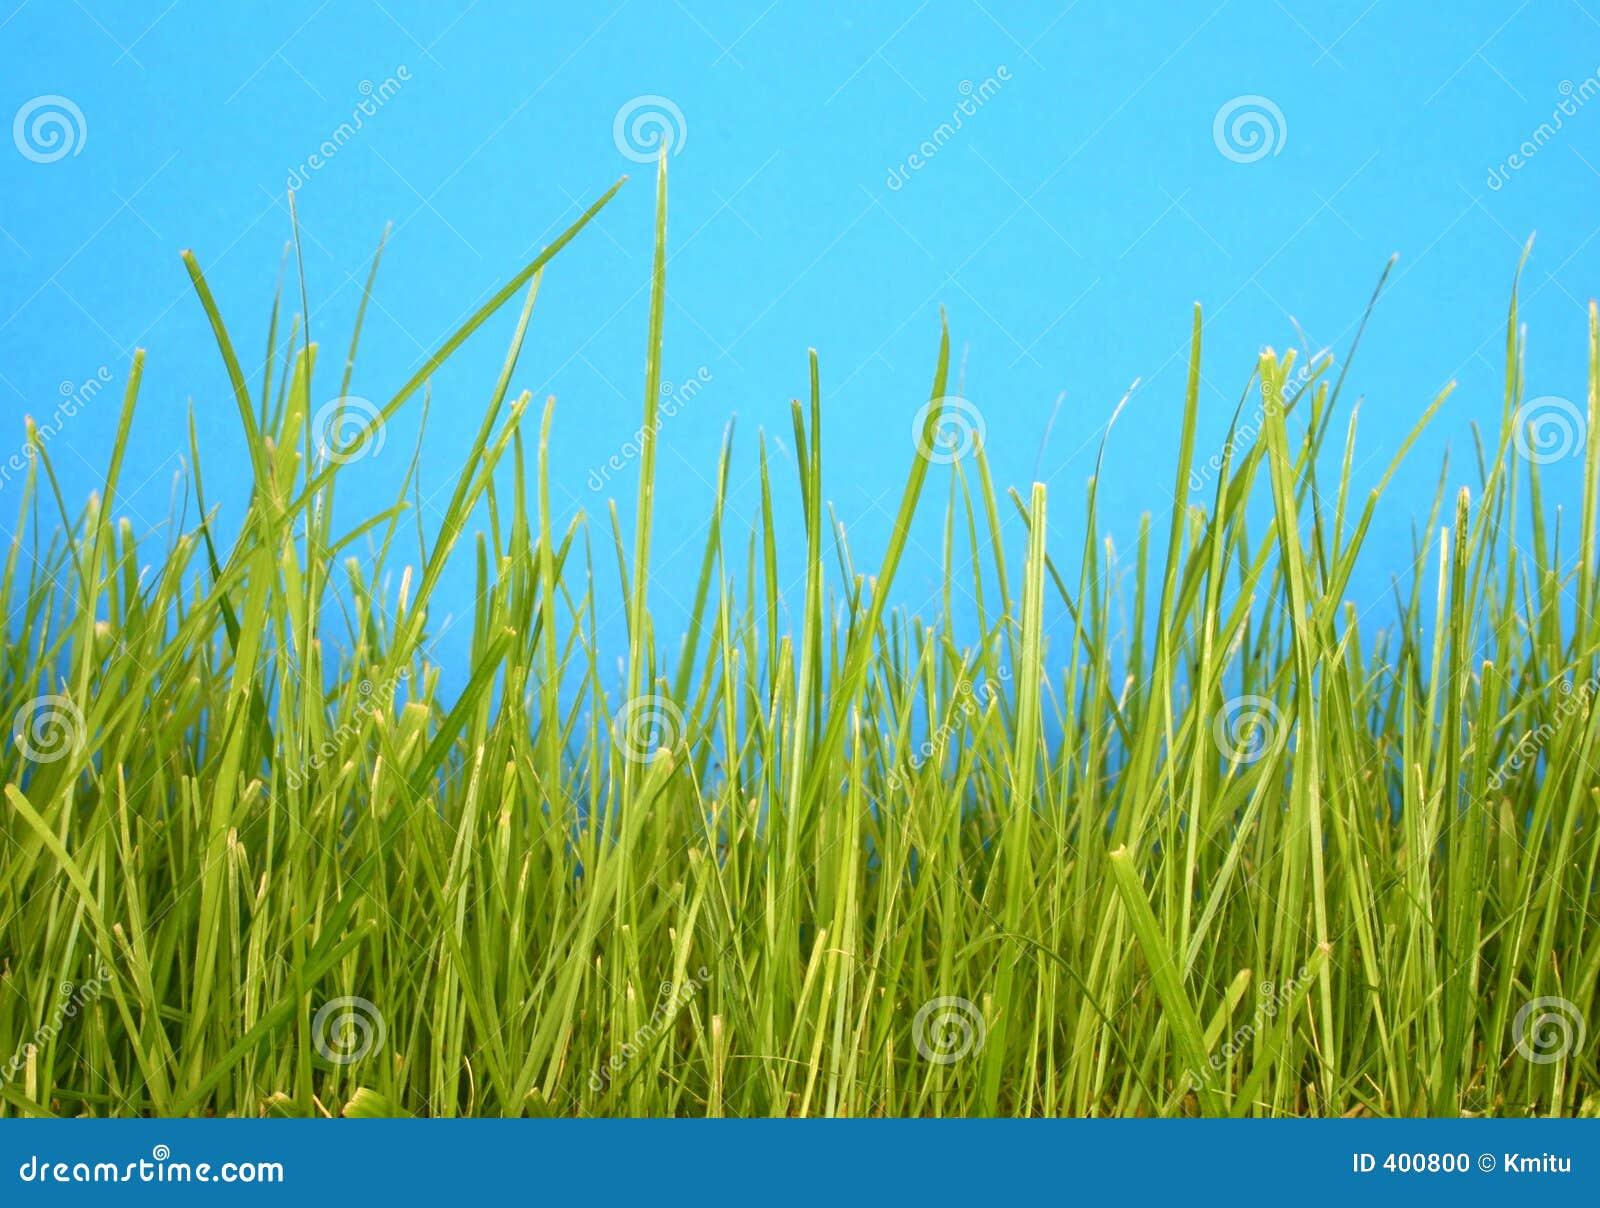 grass macro photography - photo #14